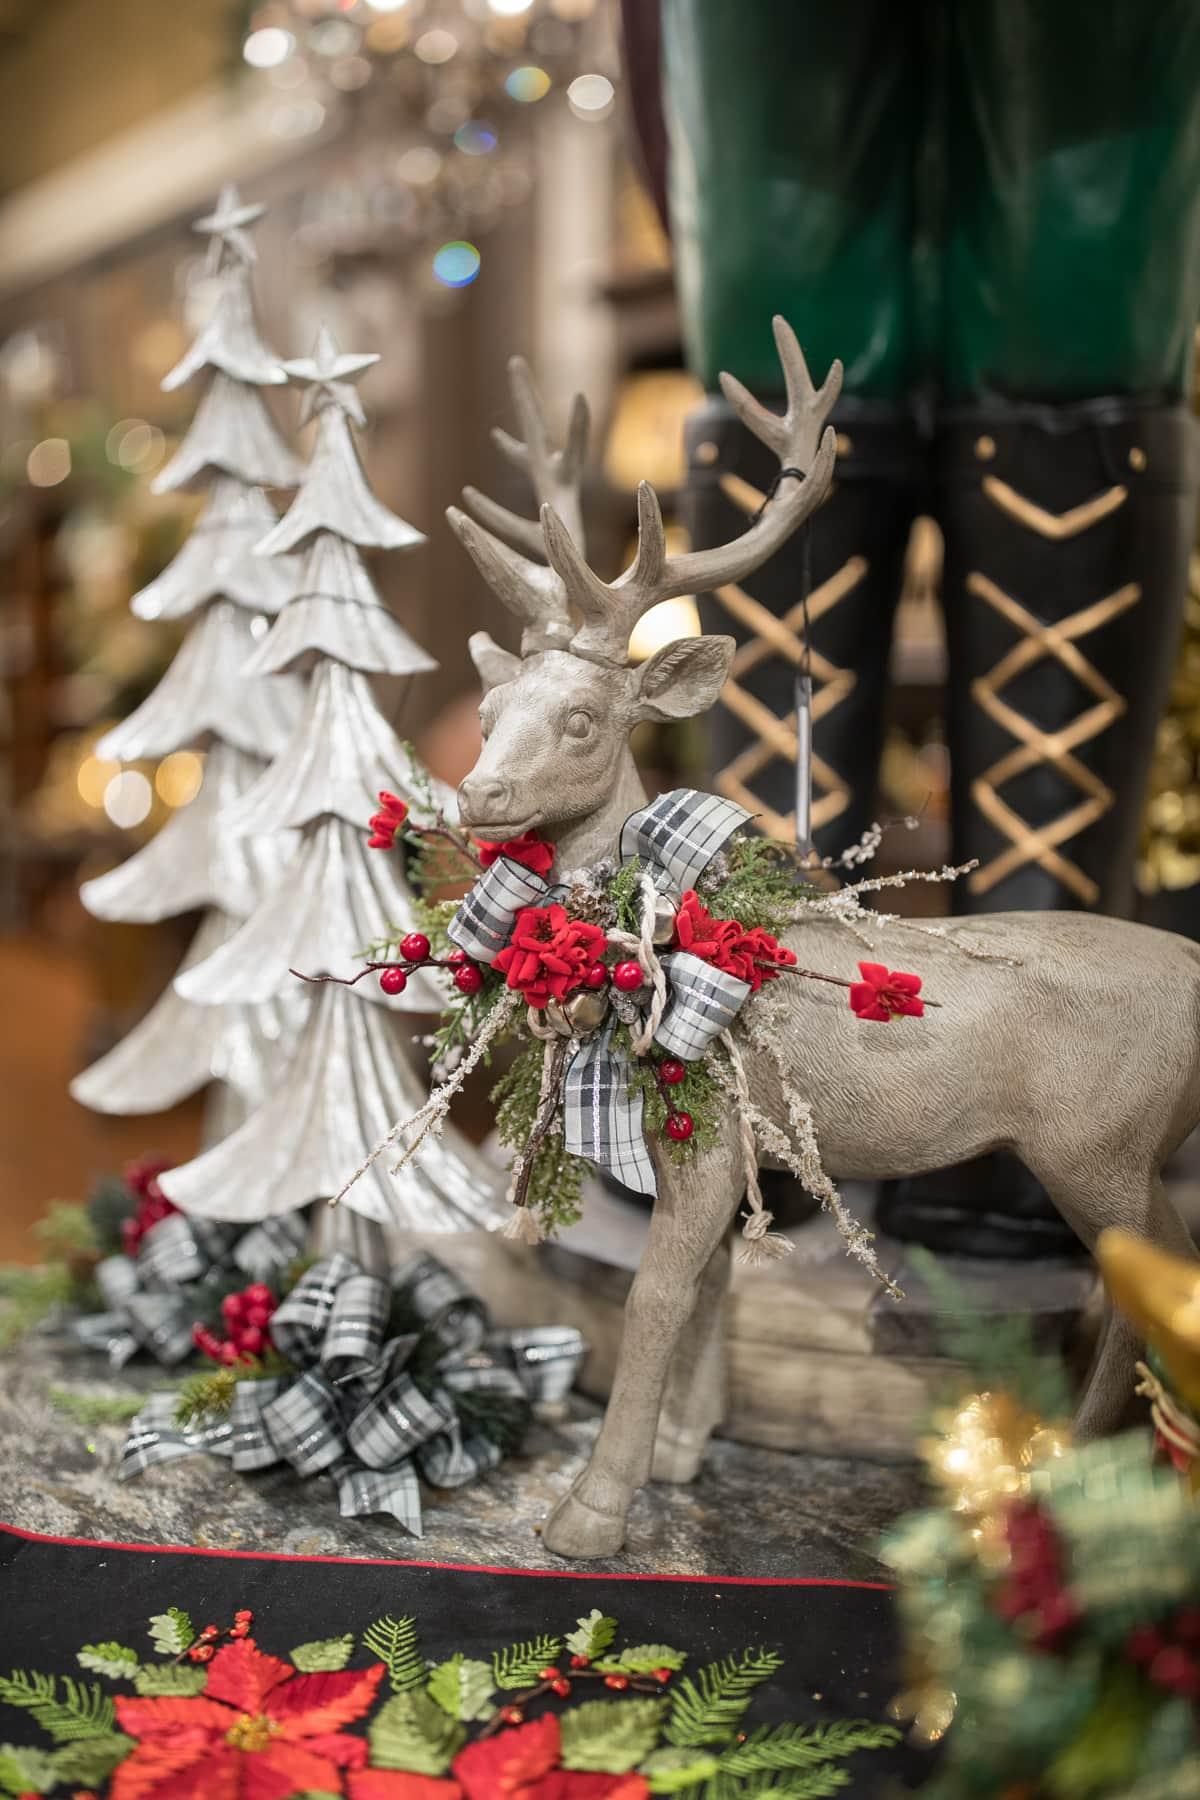 Christmas Reigndeer home decorations